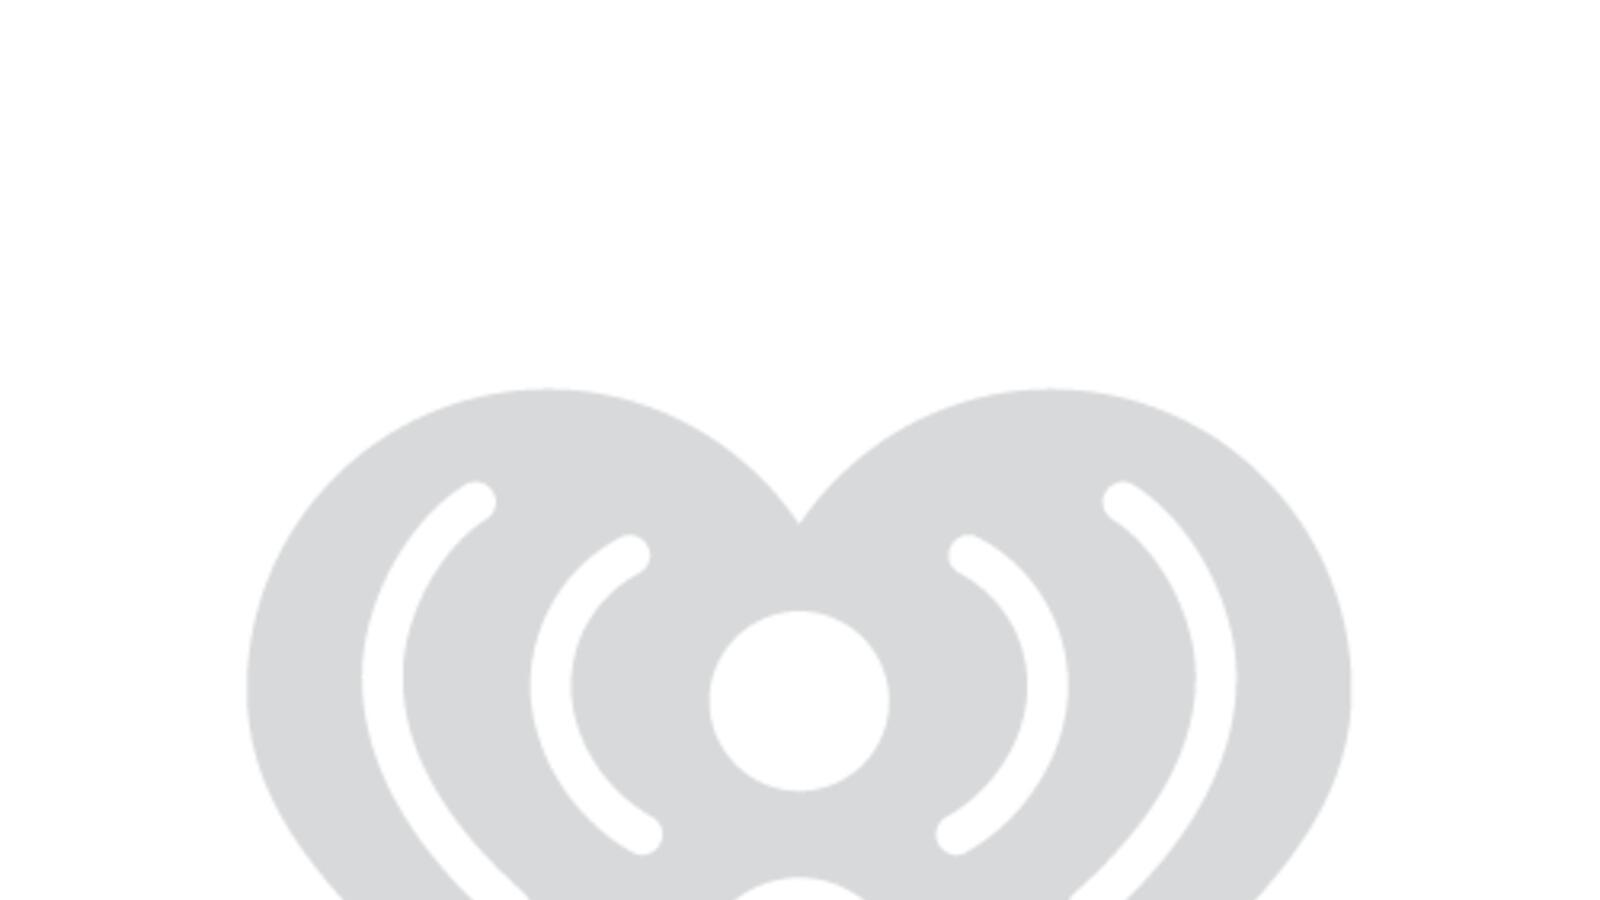 Rod Arquette Show Daily Rundown - Tuesday, September 21, 2021